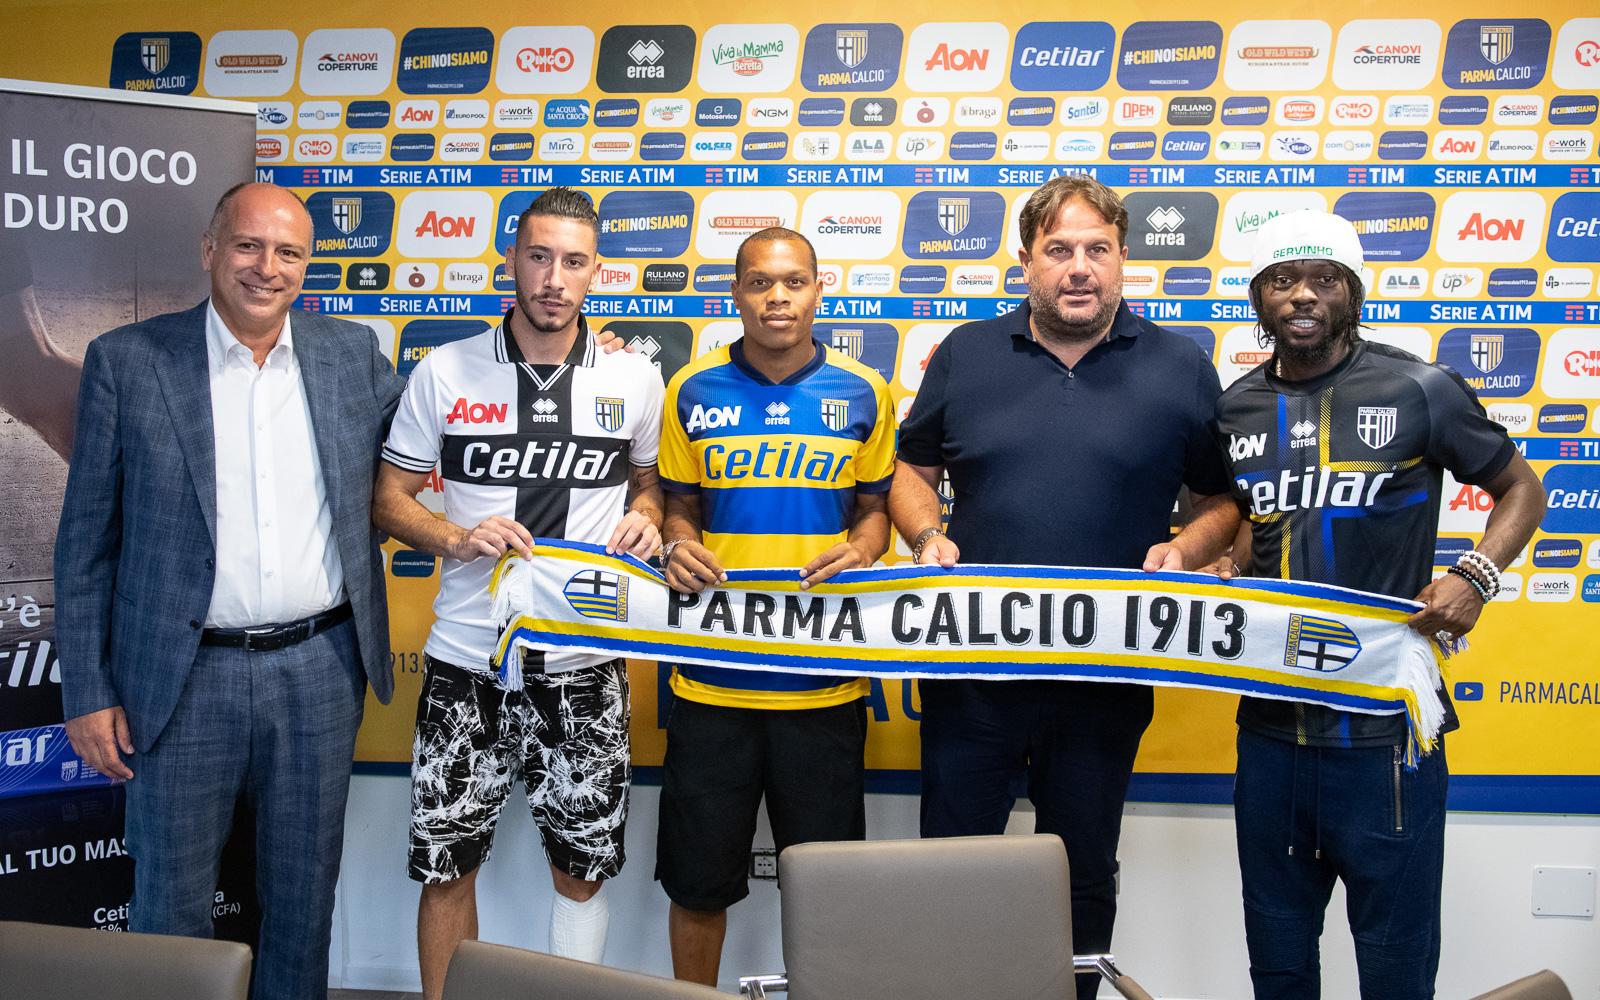 conferenza stampa presentazione partnership tra cetilar e parma calcio